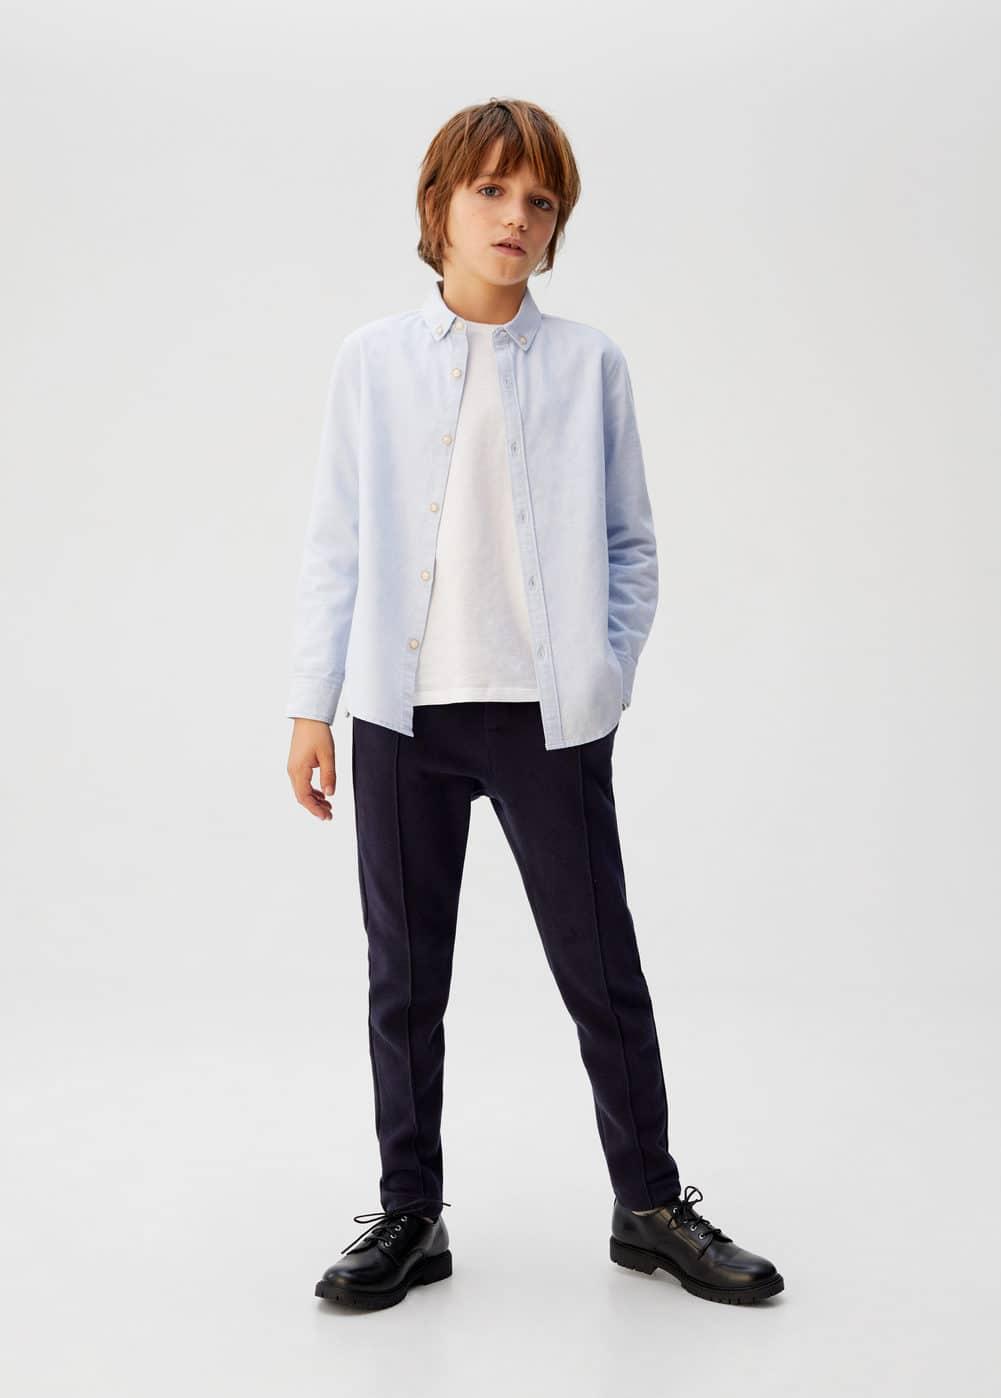 o-jet:pantalon recto costura